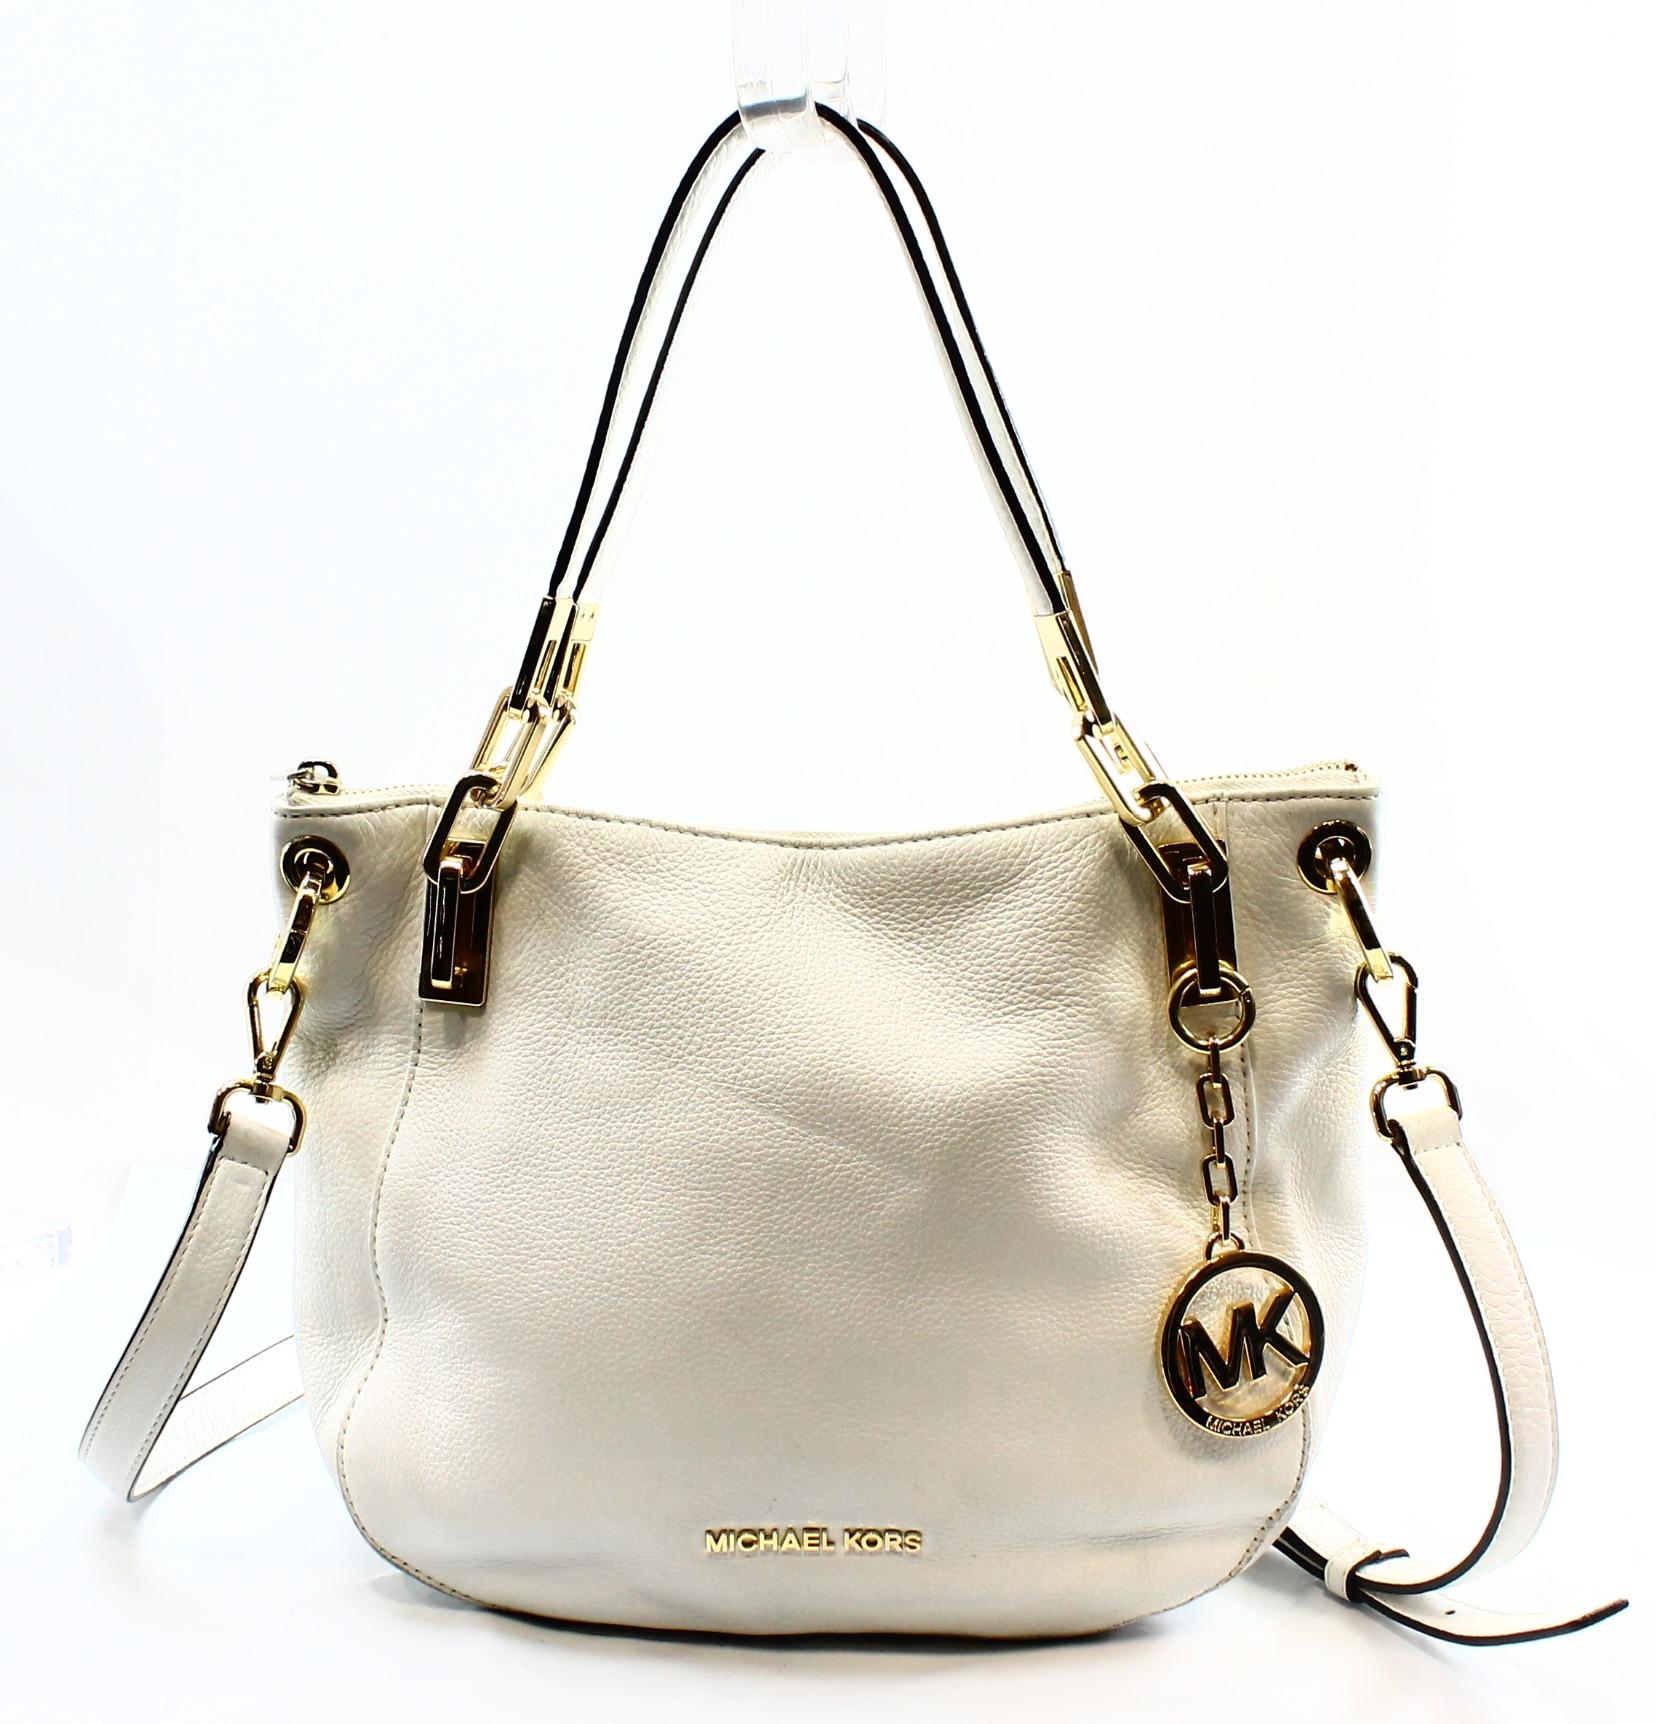 Michael Kors NEW Optic White Leather Jet Set Chain Shoulder Bag Purse